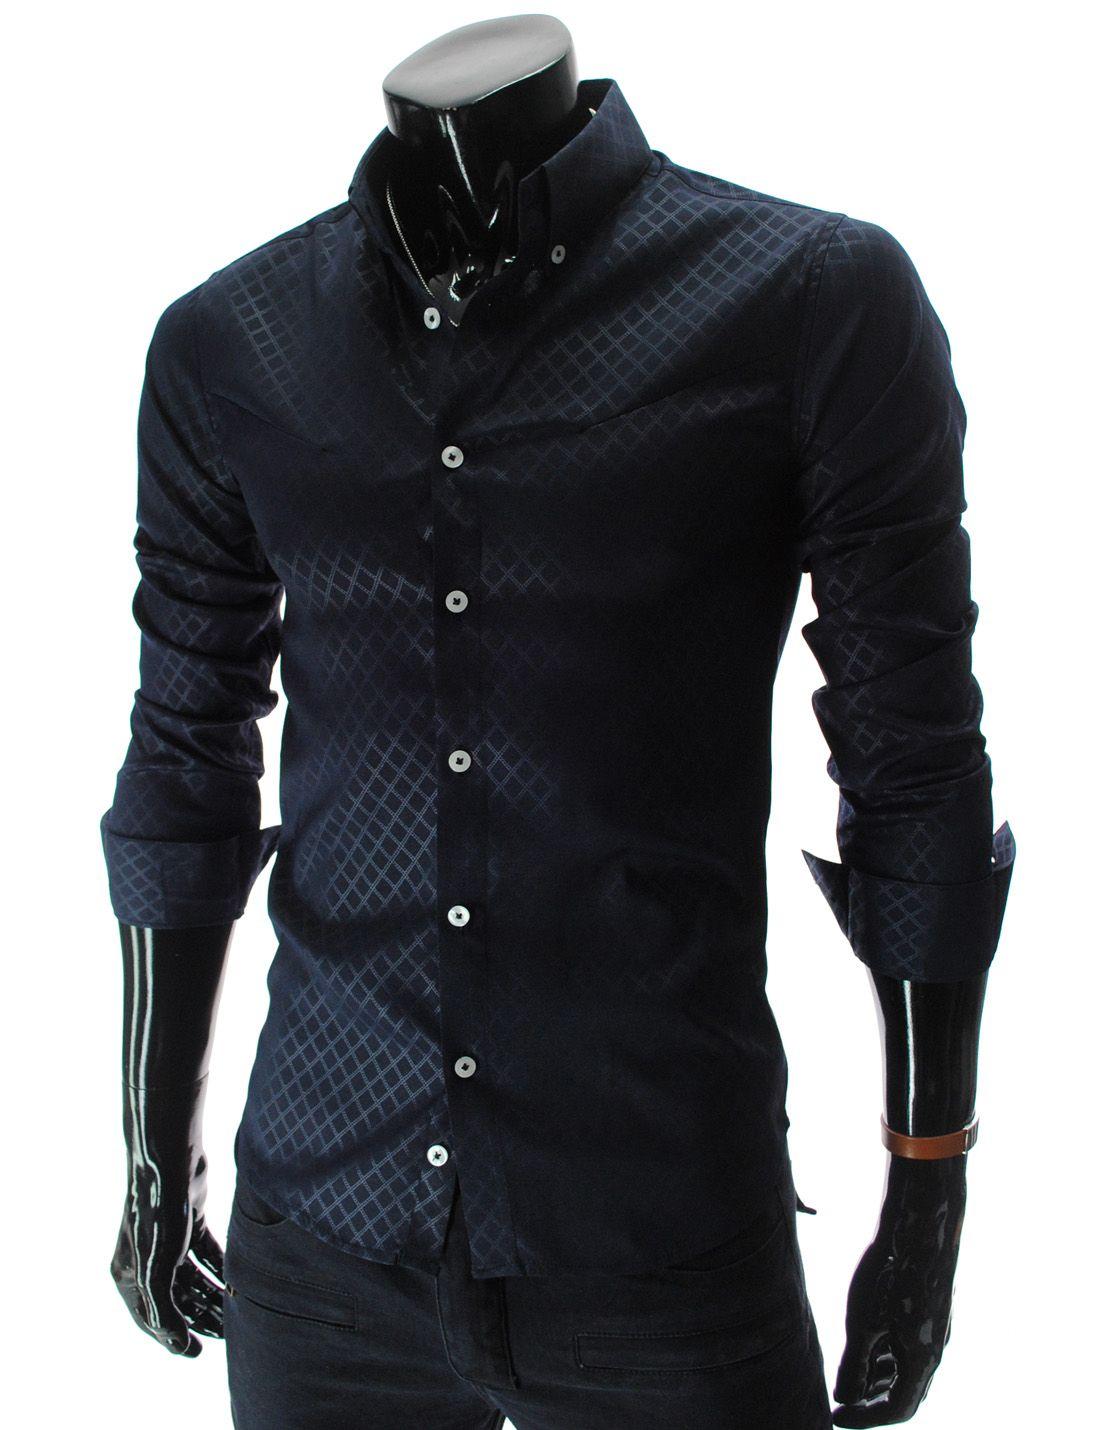 Patterned Dress Shirts Best Inspiration